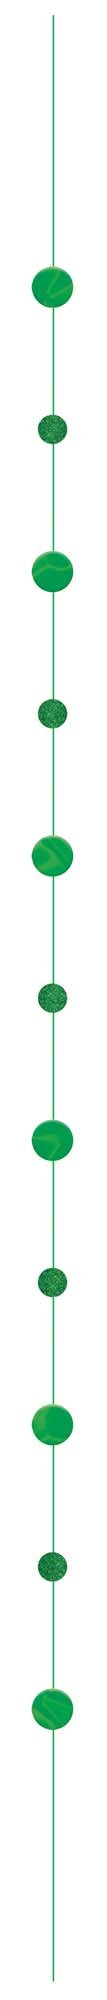 Balloon Fun Strings Green